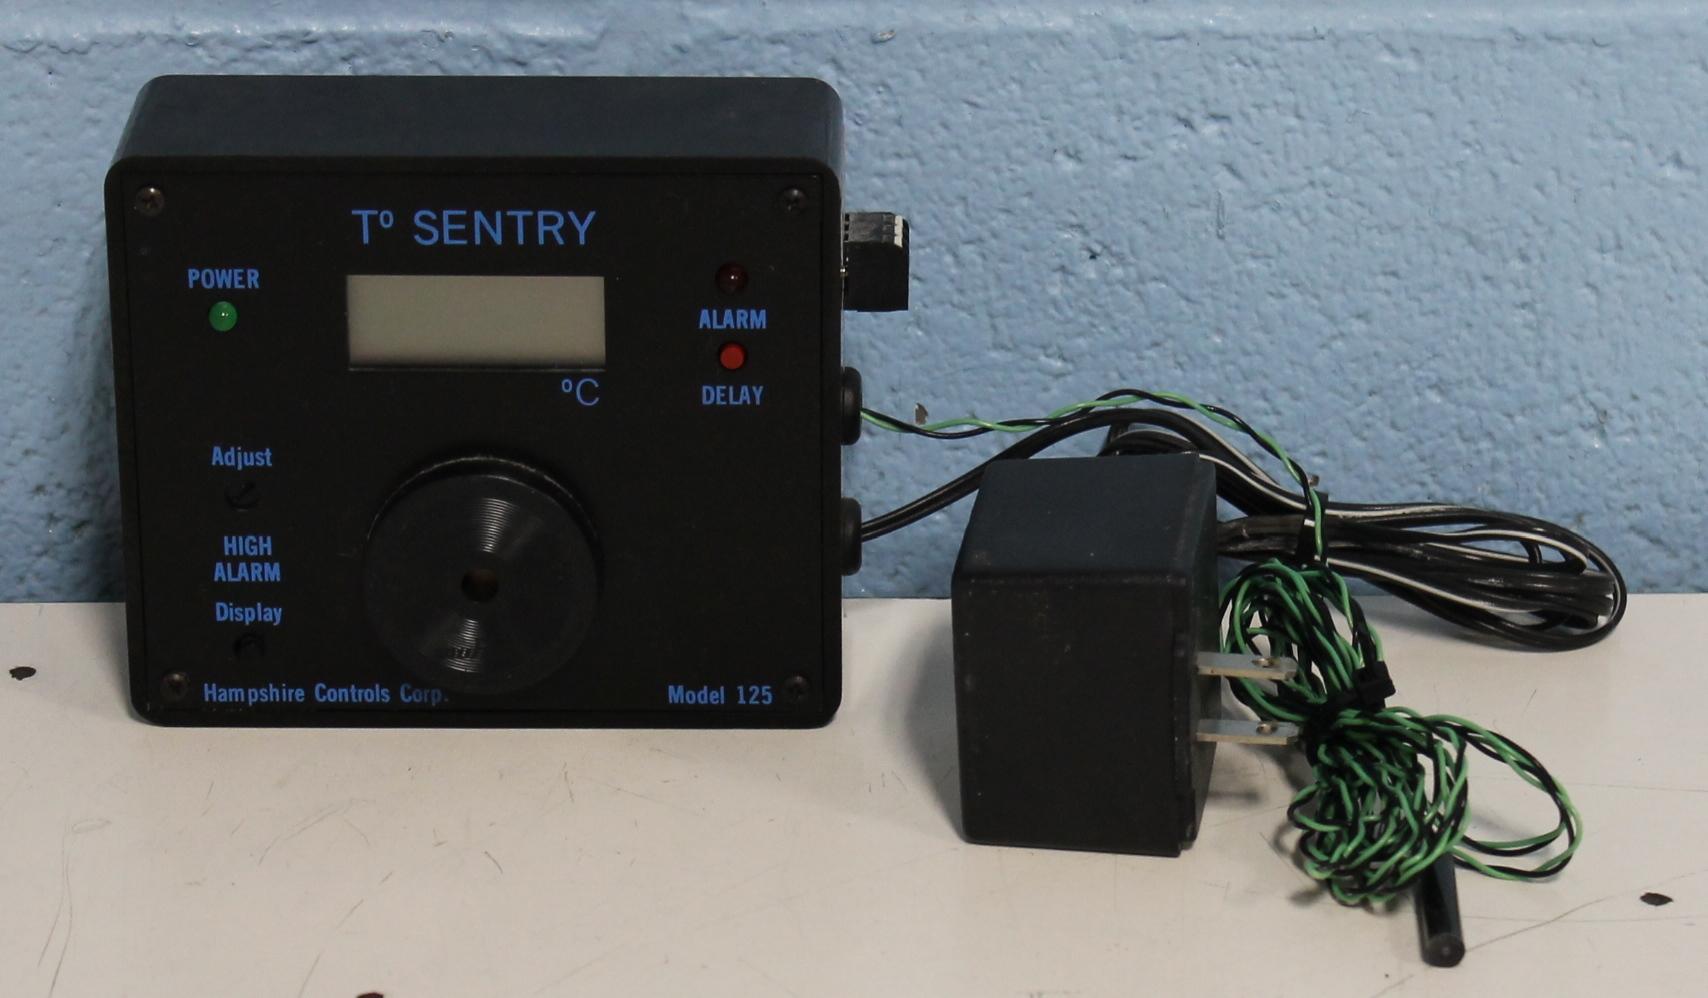 Hampshire Controls Corporation T Sentry Model 125 Digital